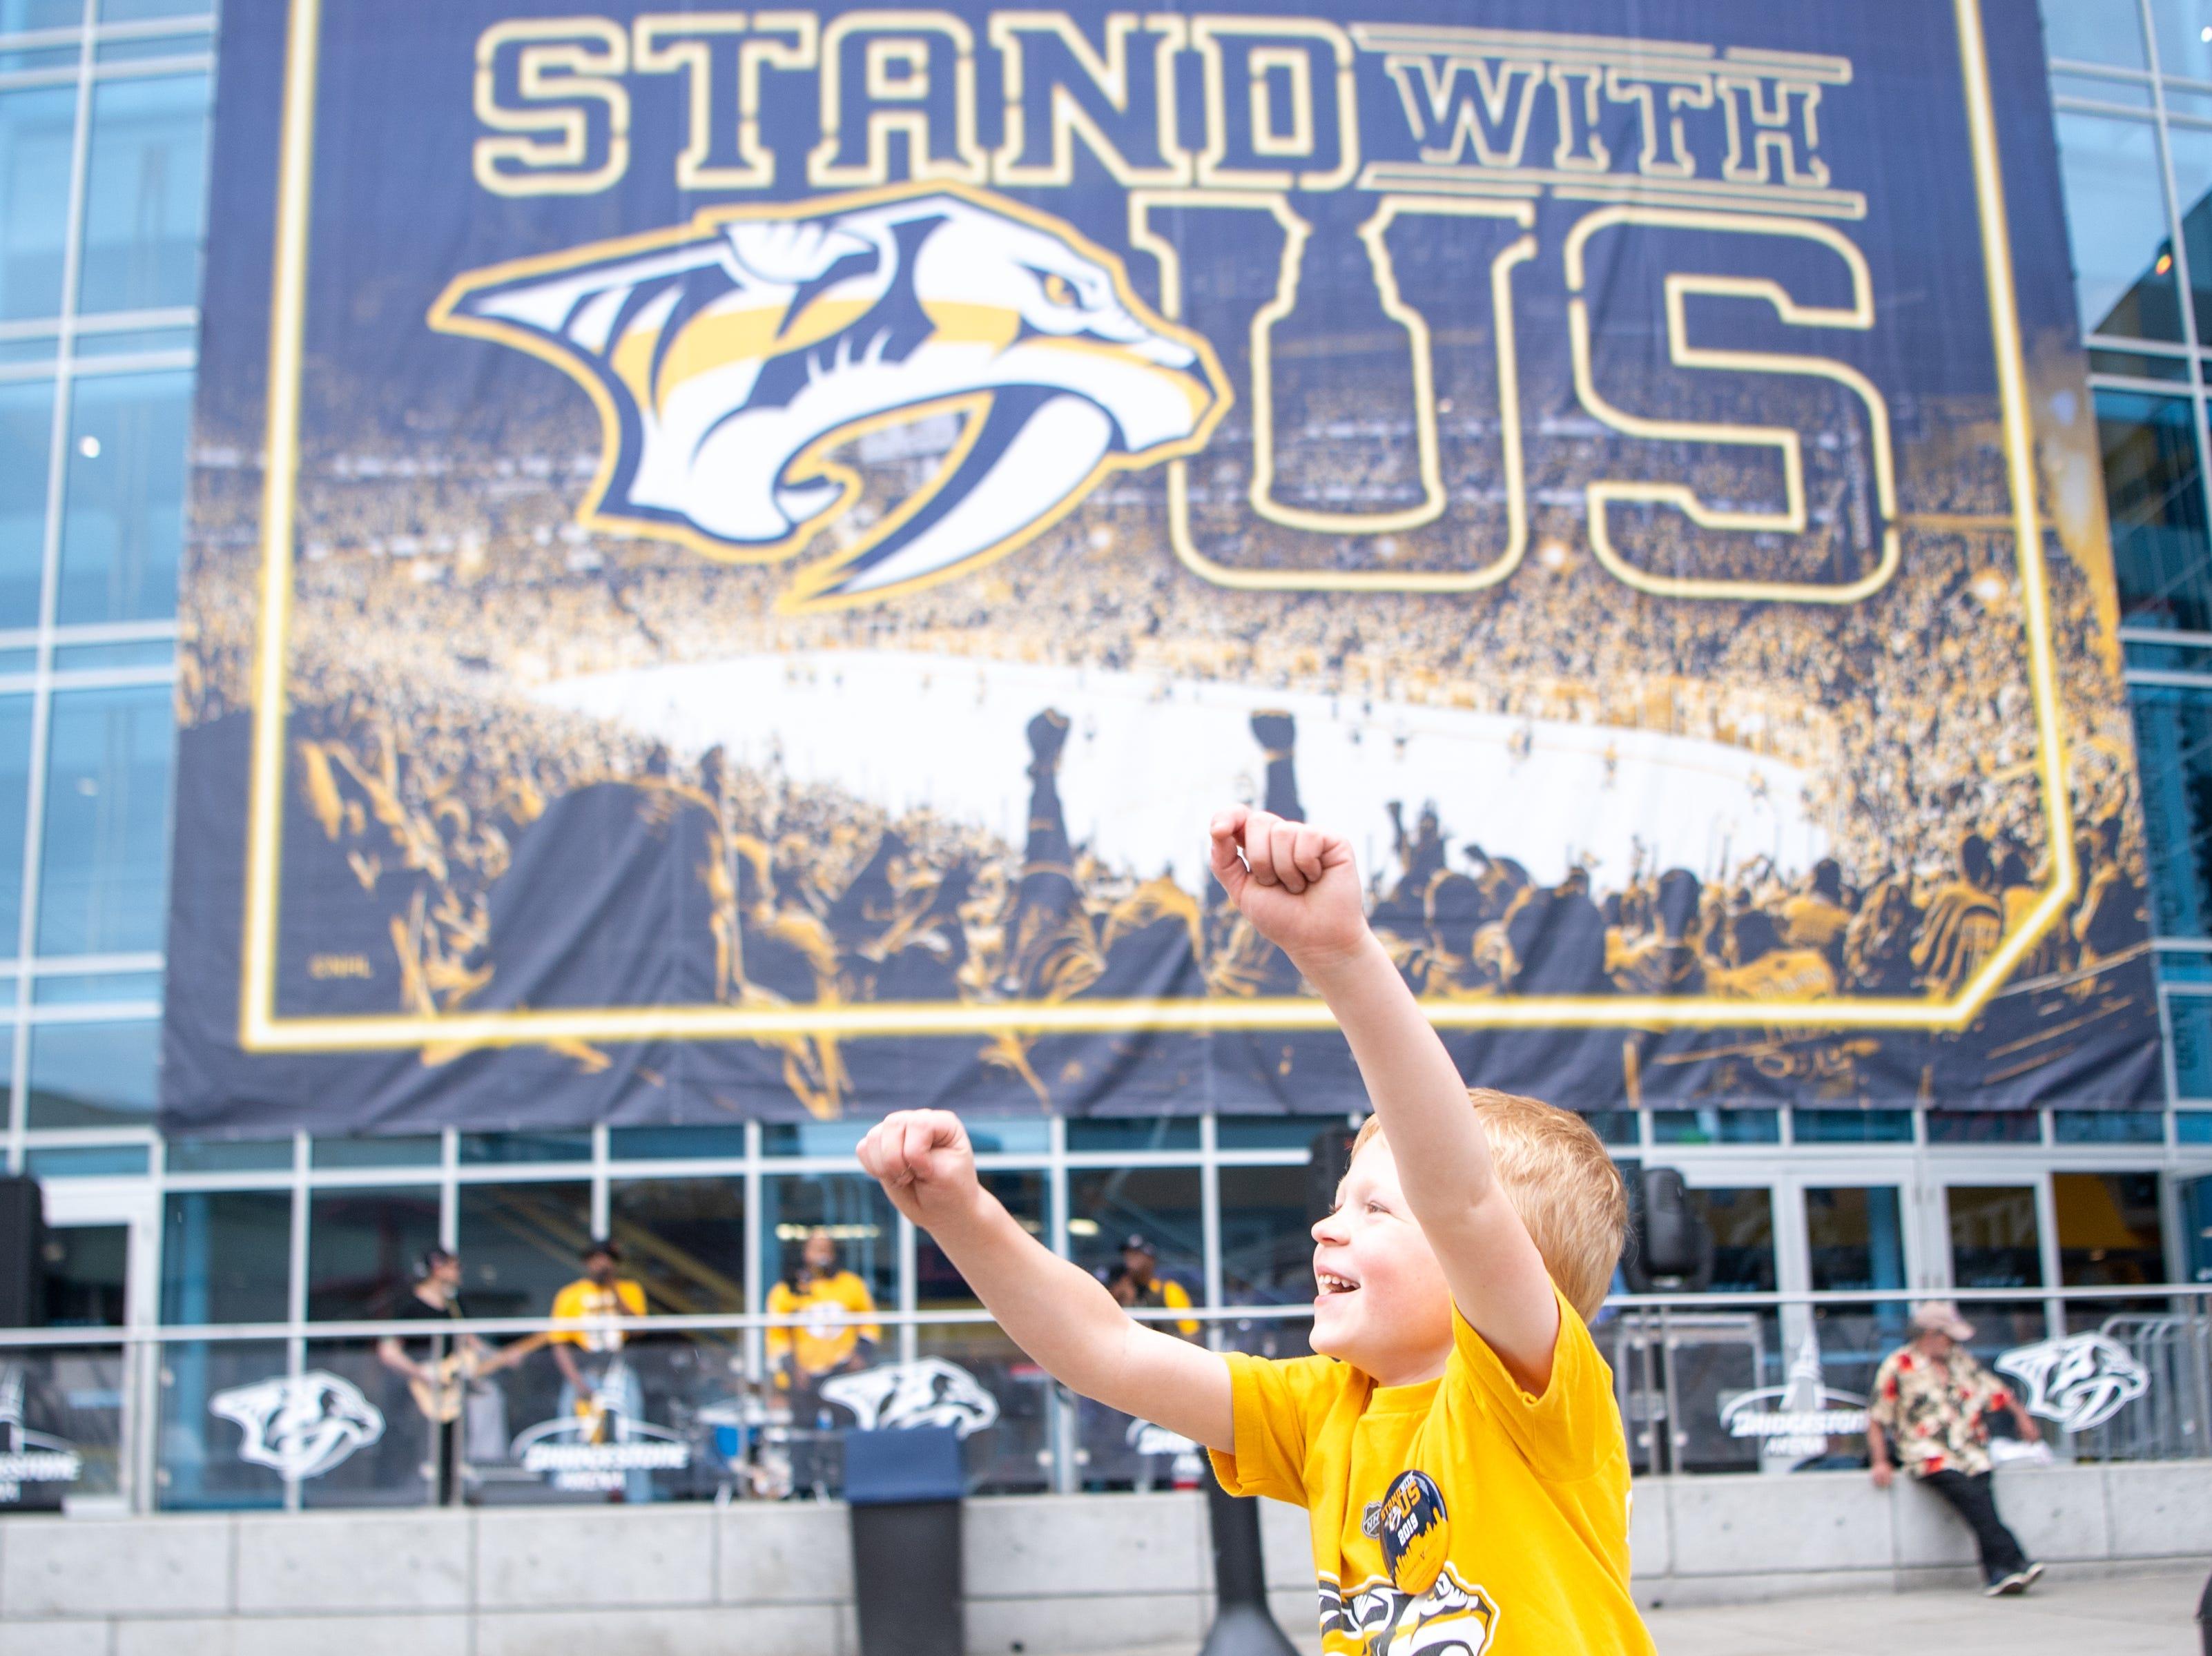 Riley Bolt, 6, dances before the Nashville Predators game against the Dallas Stars at Bridgestone Arena Saturday, April 13, 2019, in Nashville, Tenn.